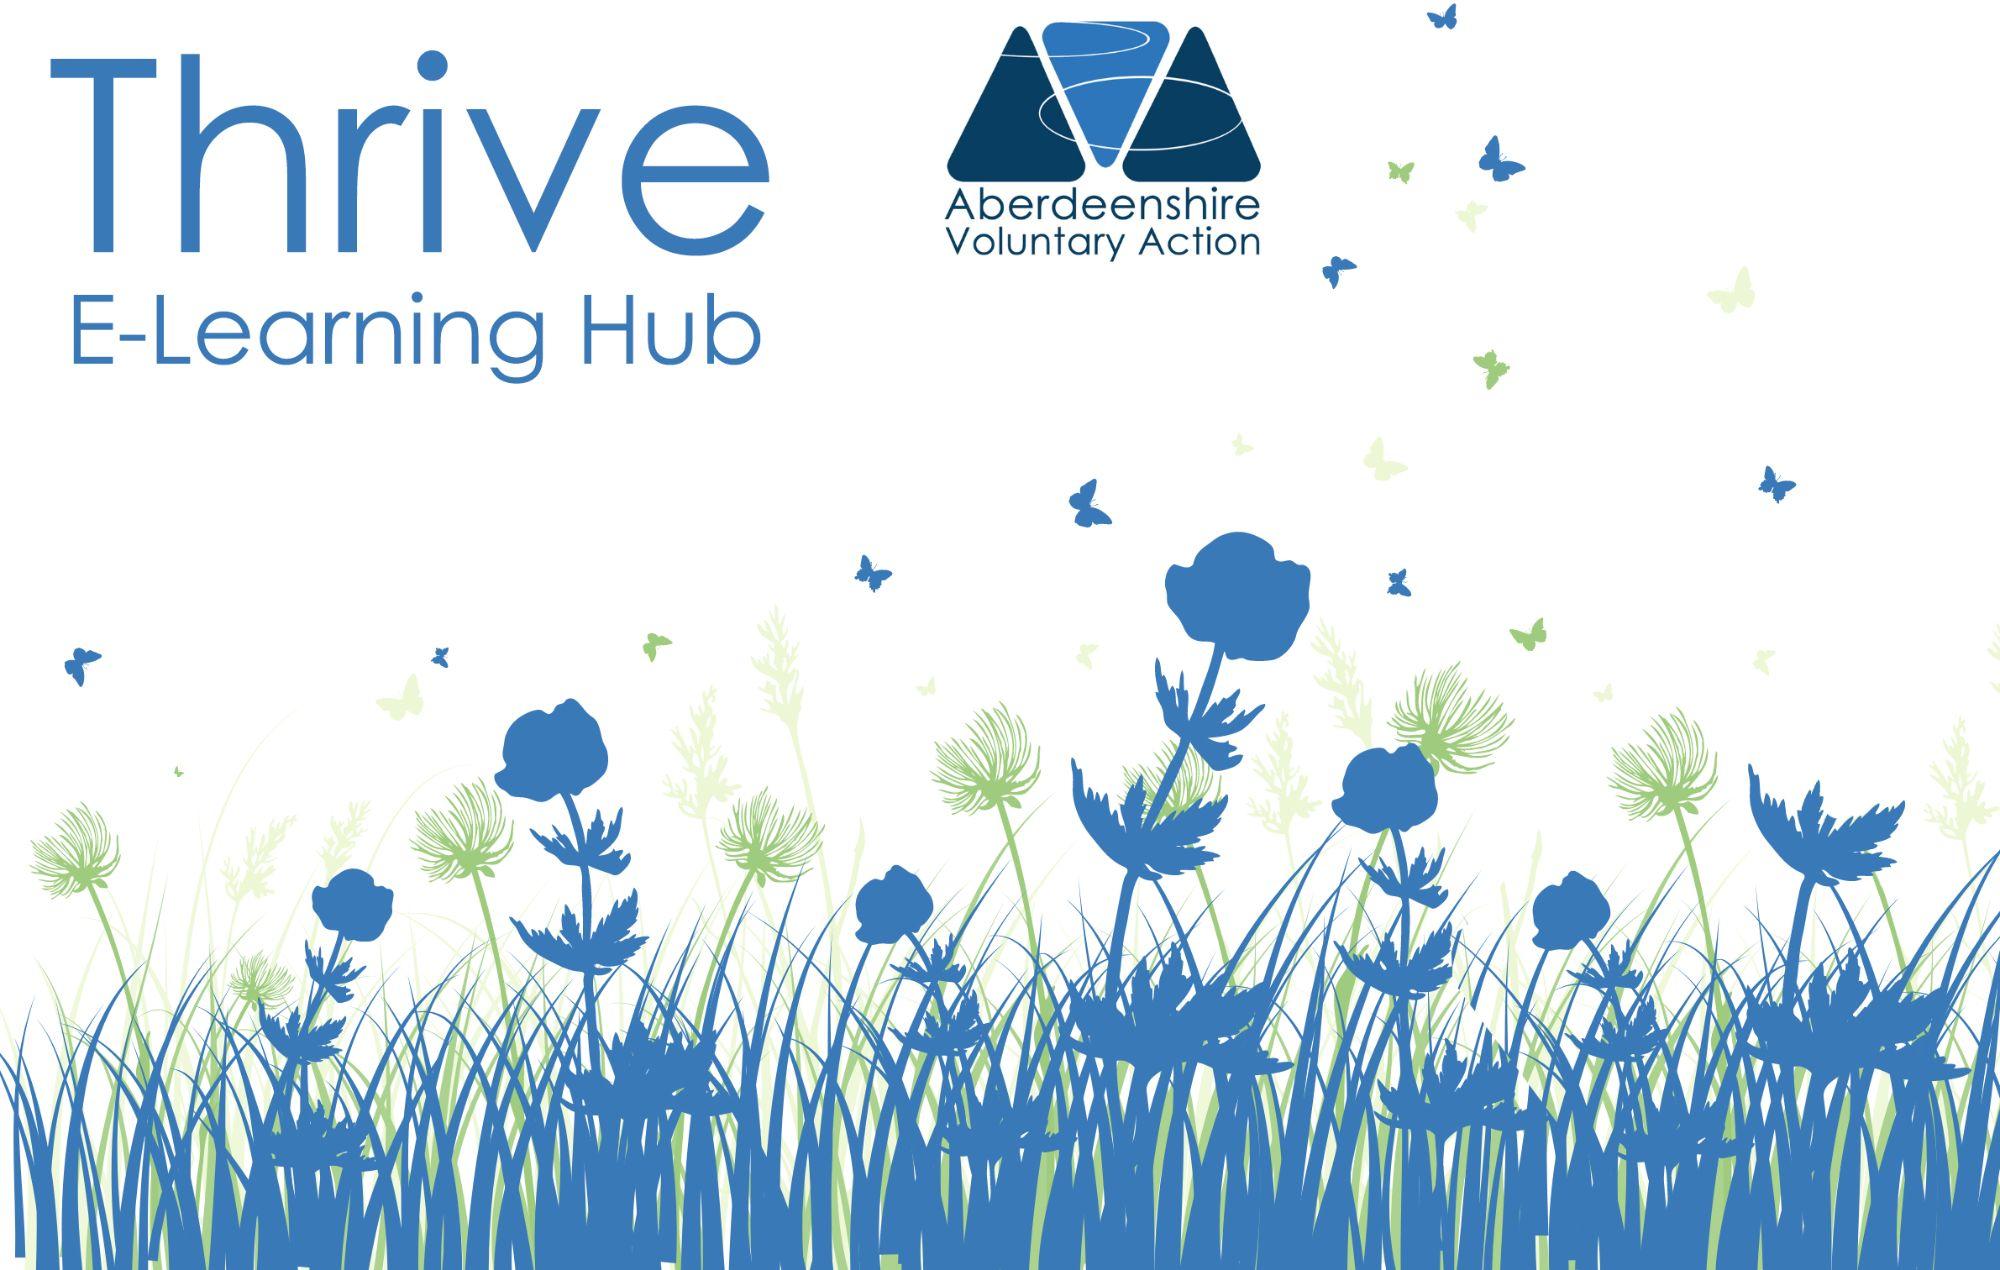 Aberdeenshire Voluntary Action Training